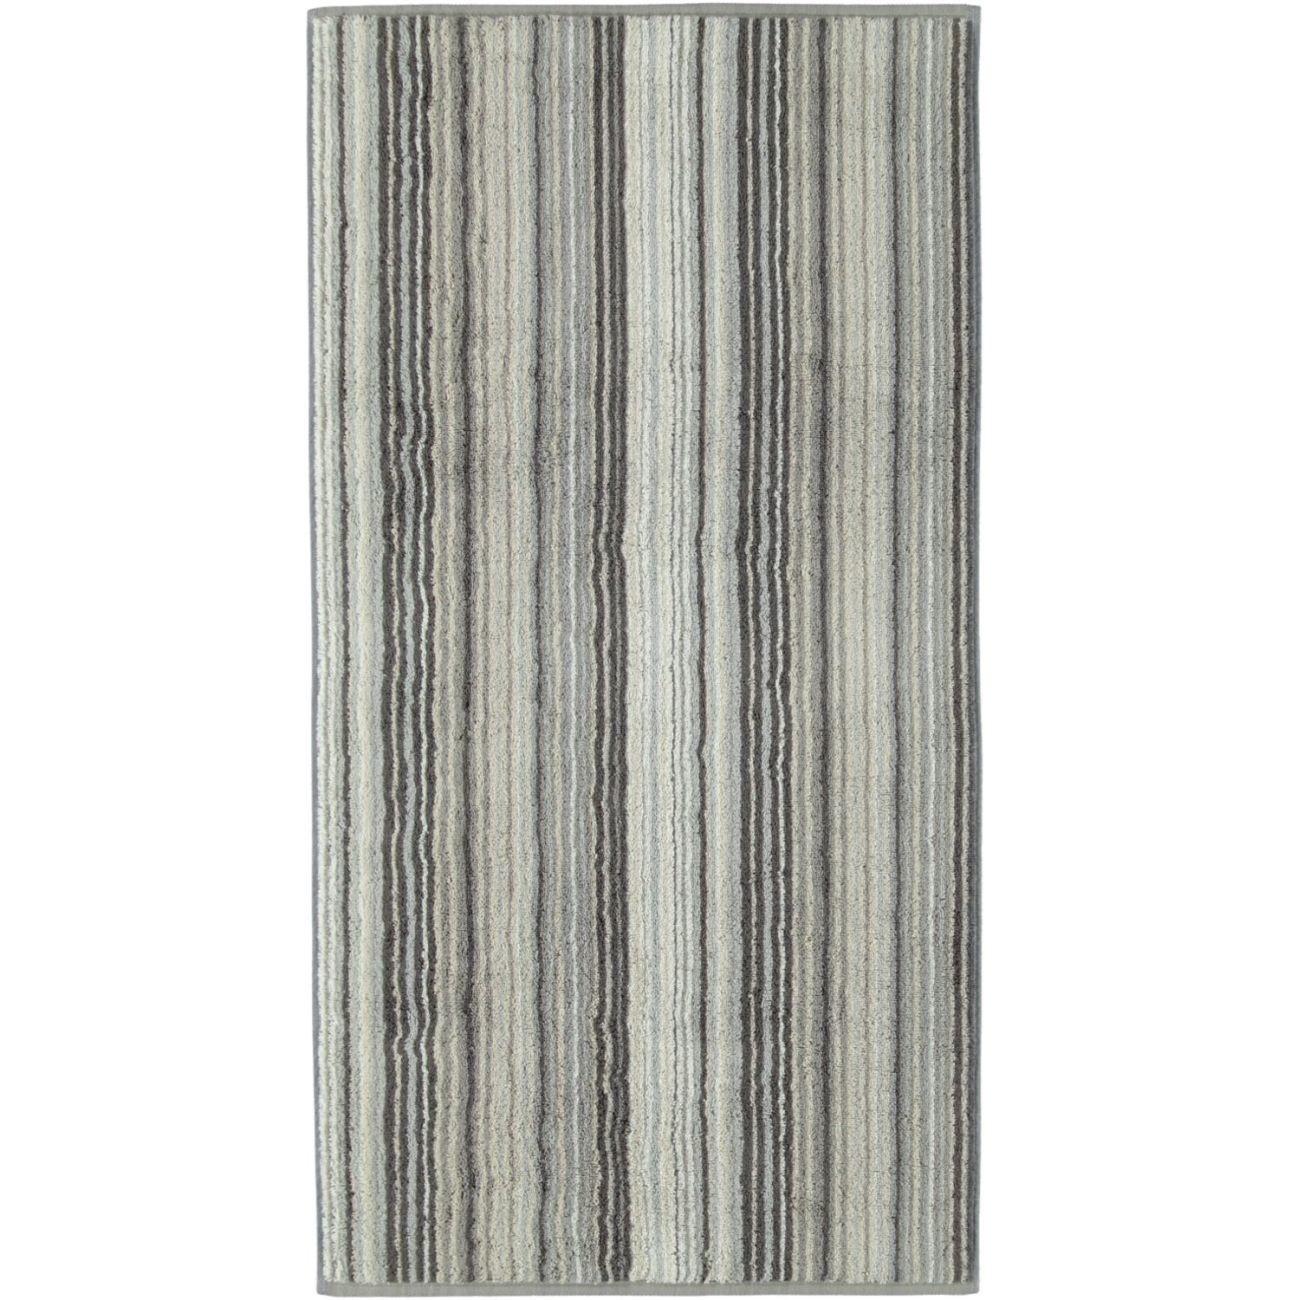 Cawö Two-Tone Multistripe Handtuch